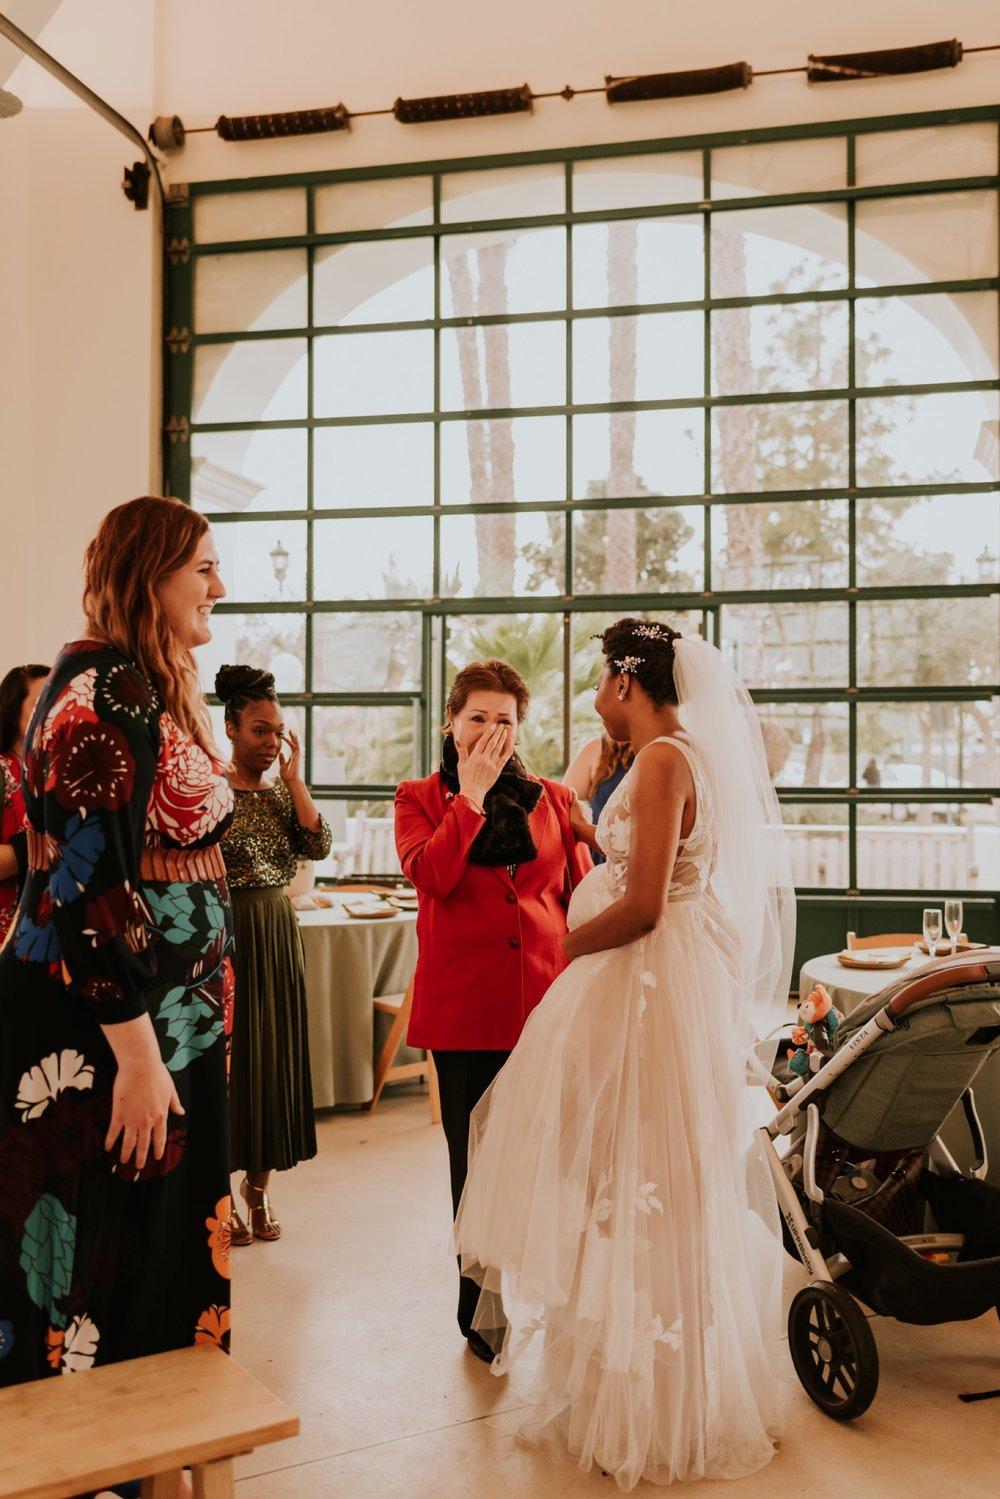 carousel-house-santa-barbara-wedding-ceremony-117.jpg